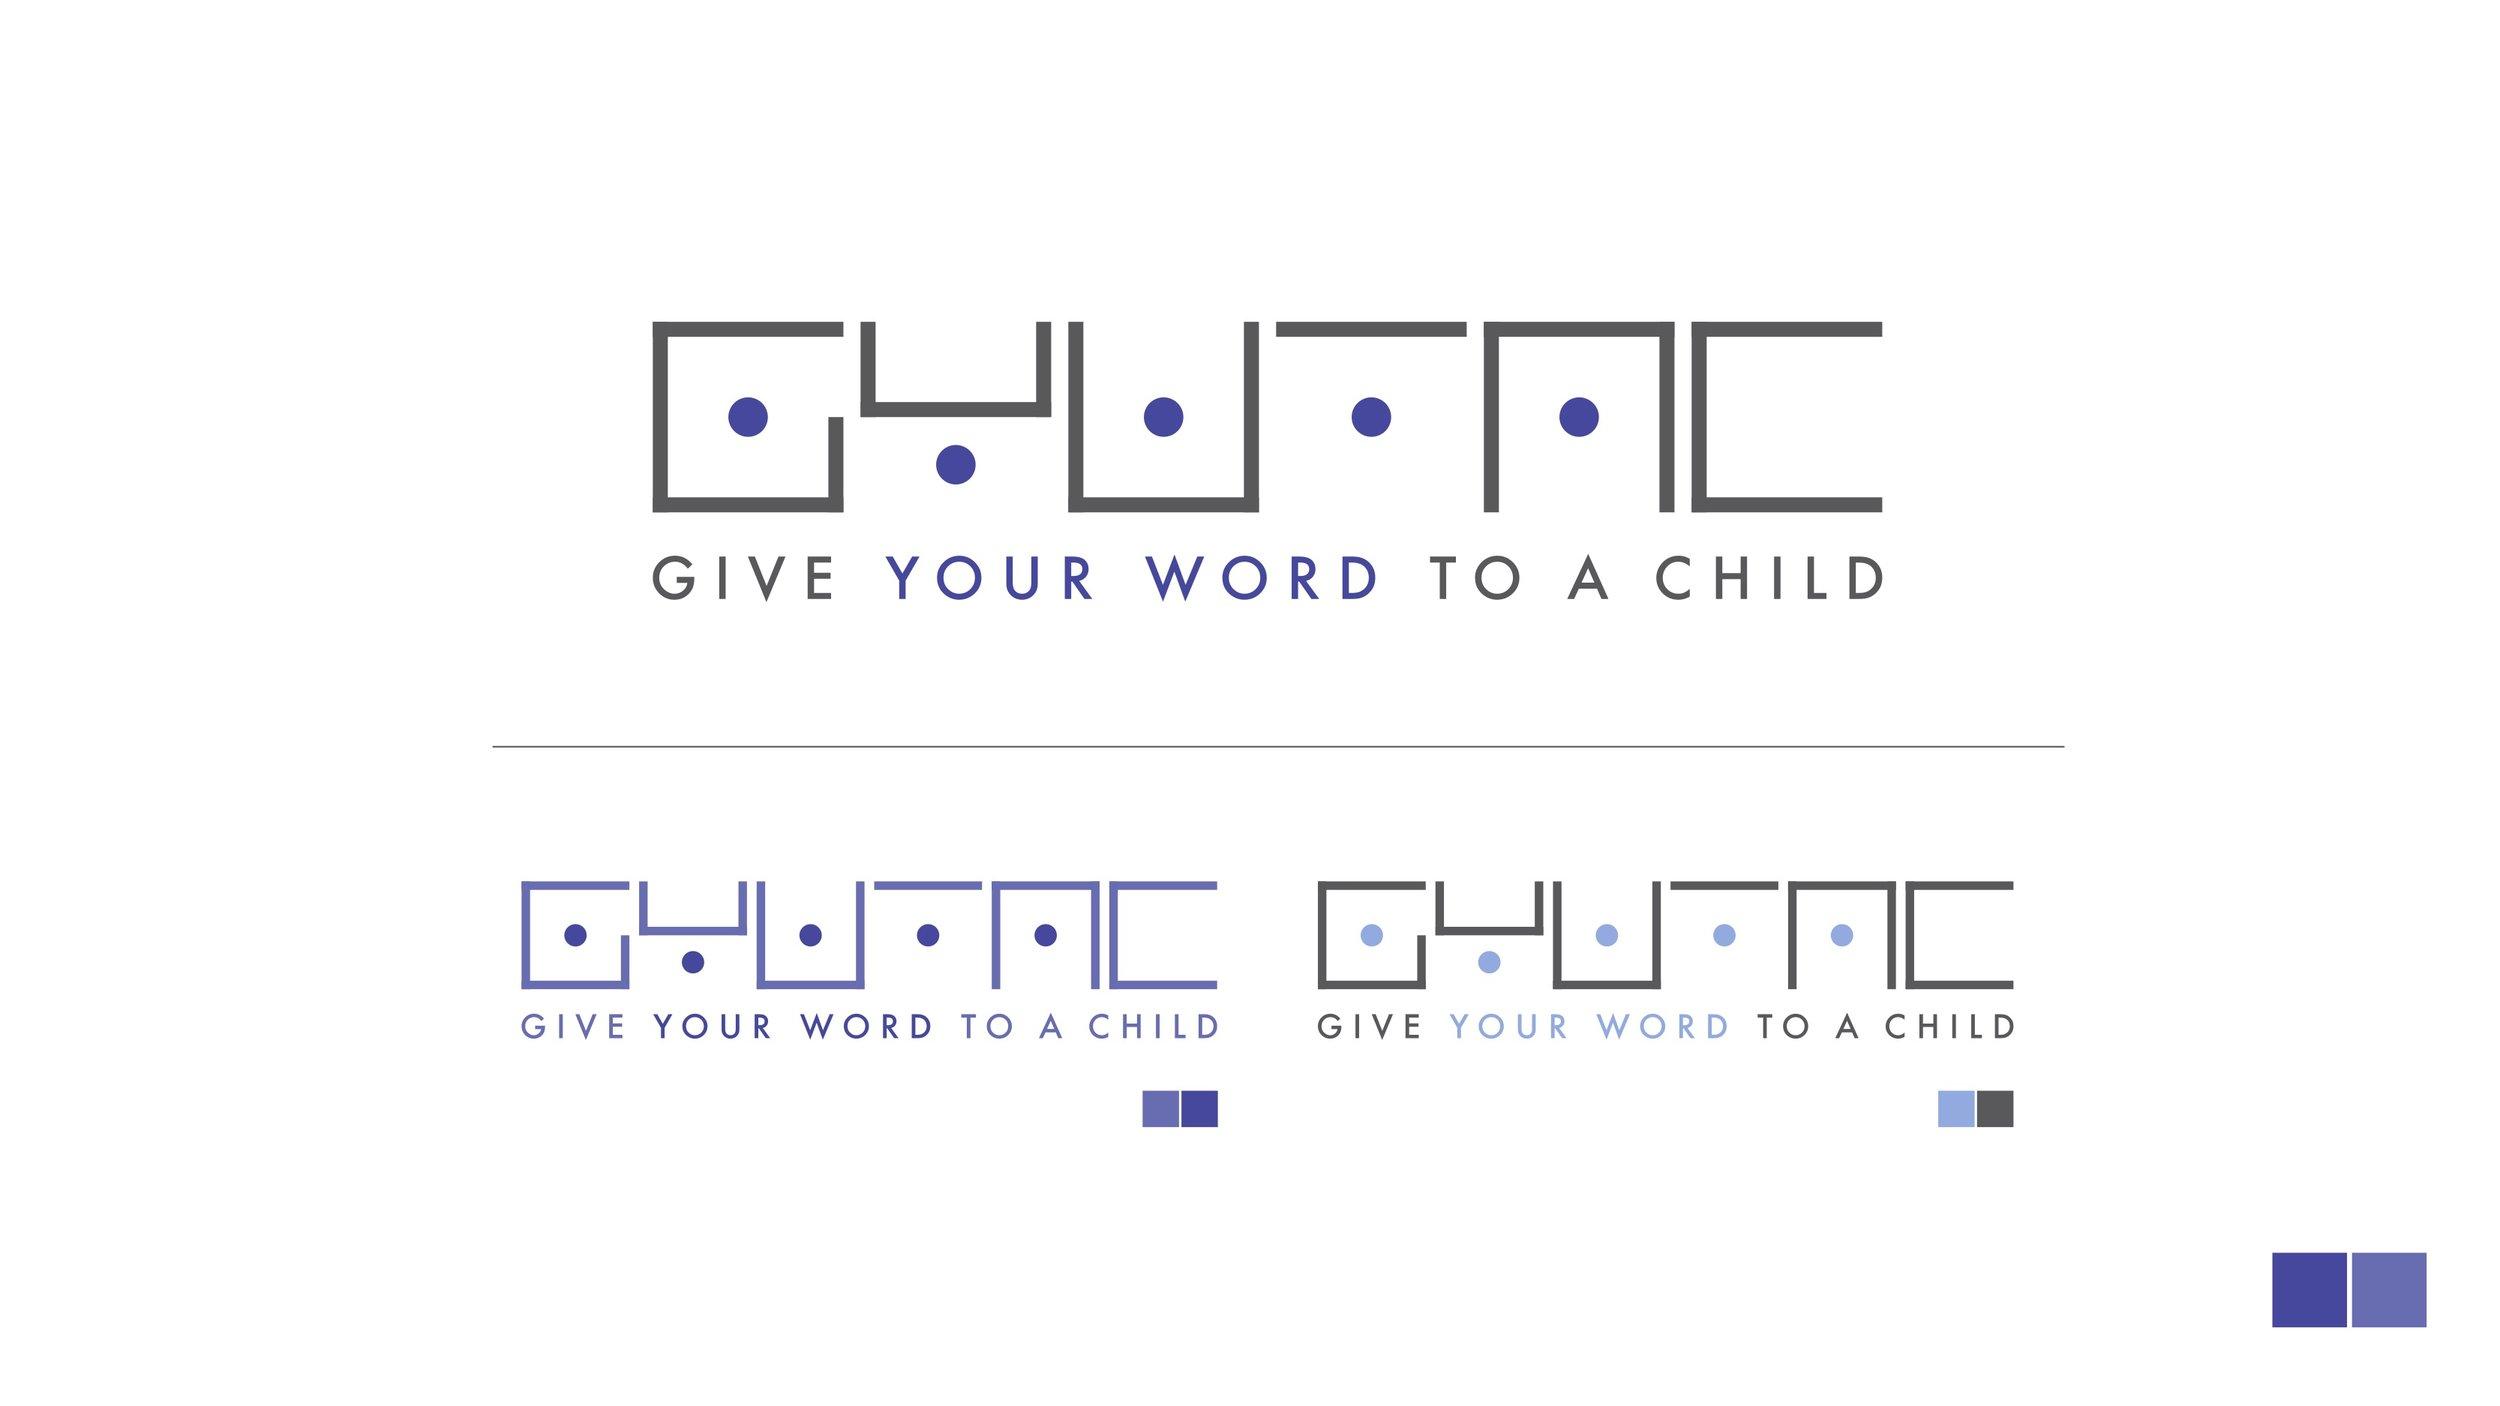 07_2_GYW_Logo_Design_v3.jpg